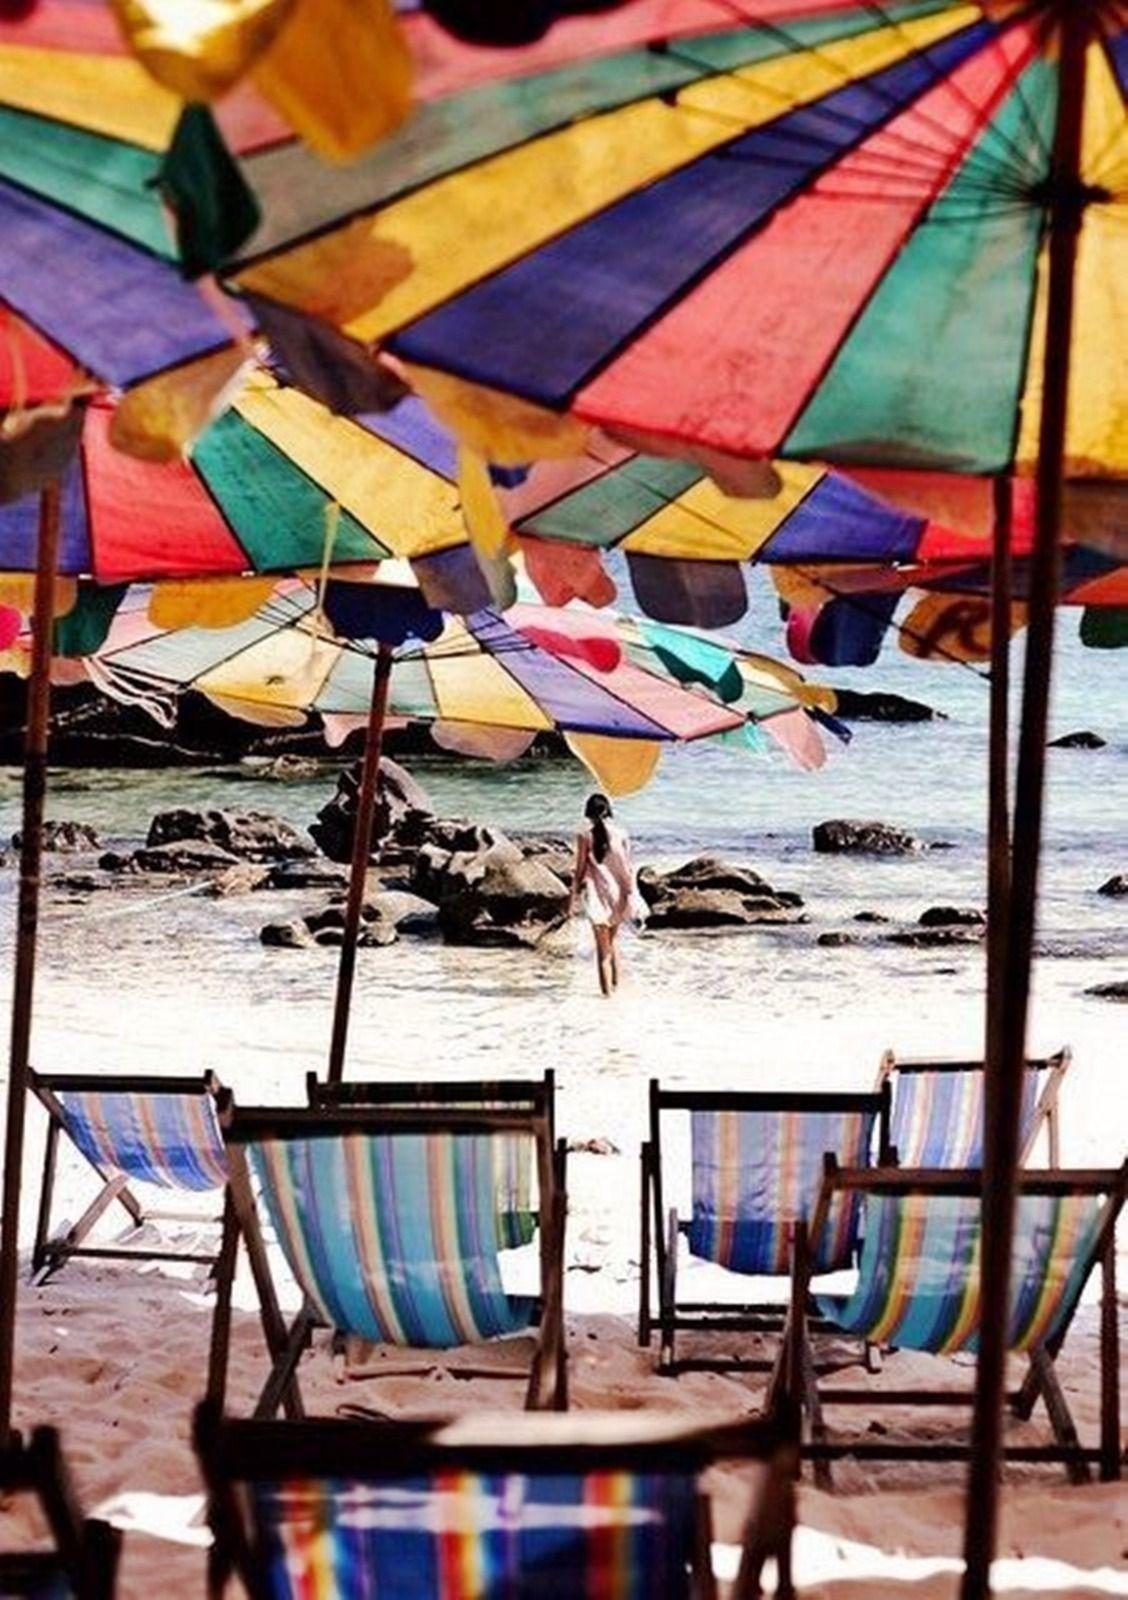 Ldy Bsil I love the beach, Colorful umbrellas, Beach